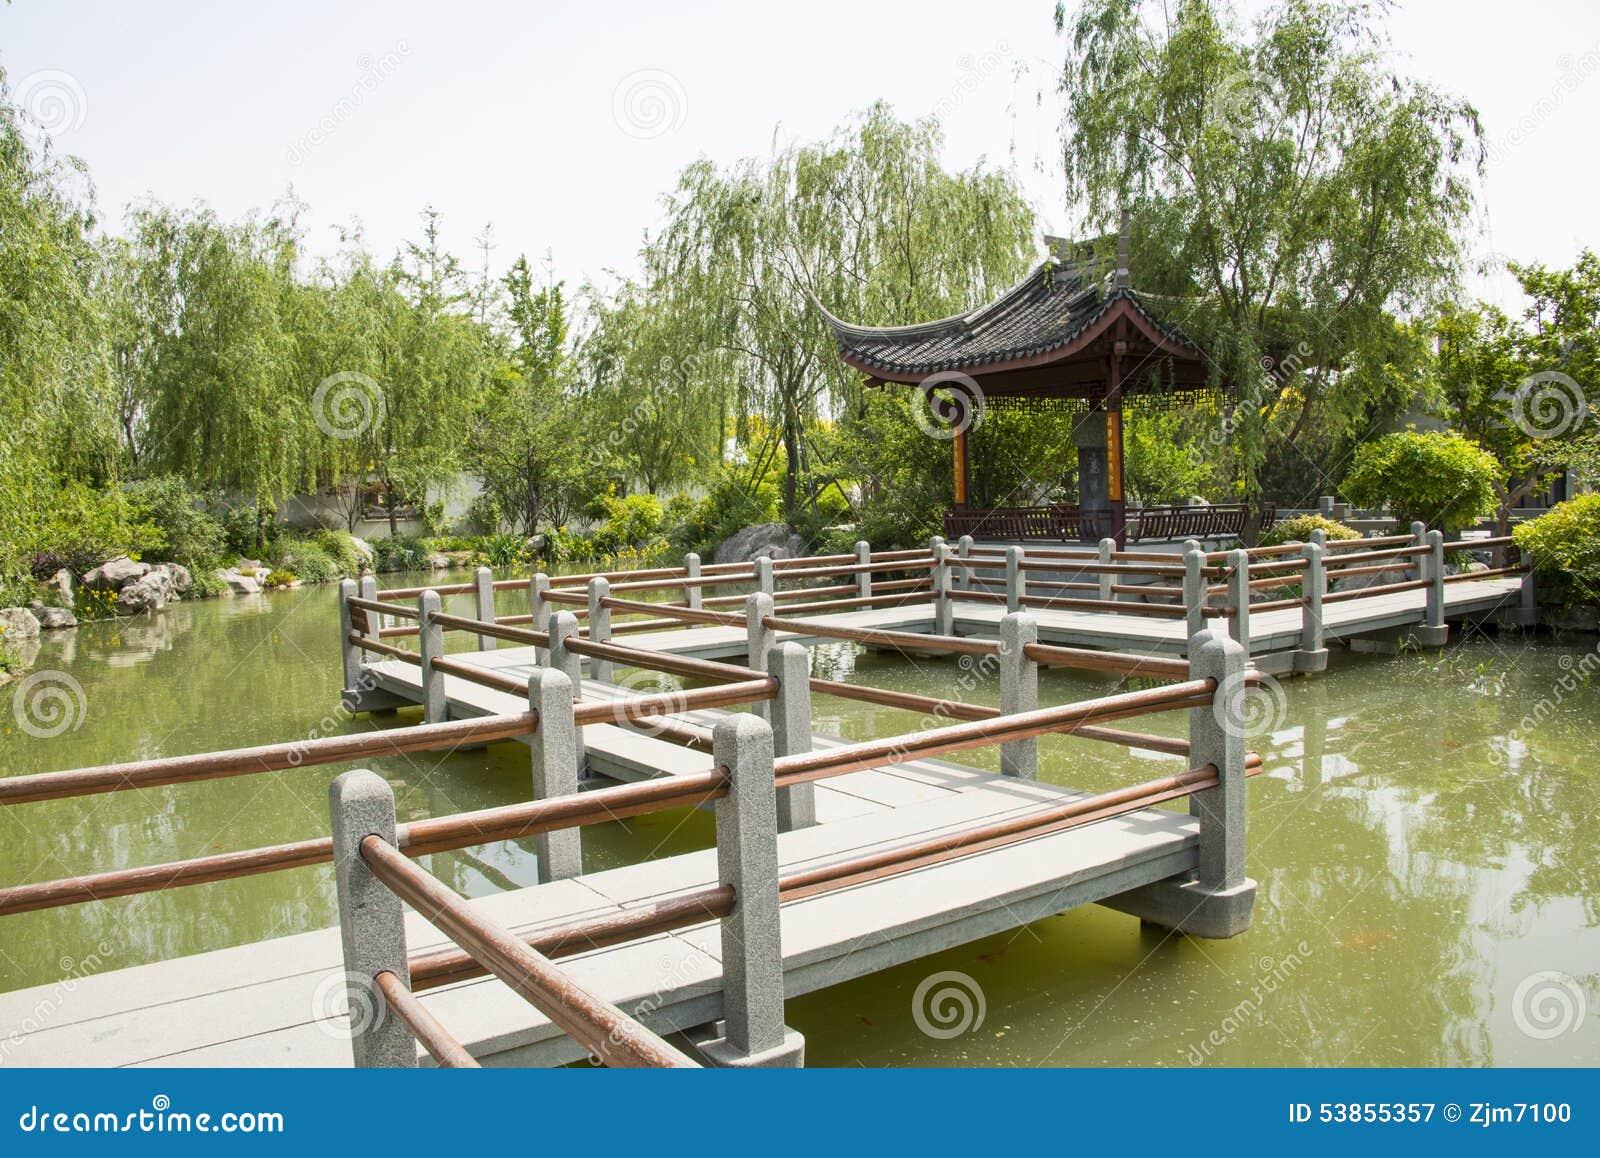 Asia China, Beijing, Garden Expo,Garden Architecture,Pavilion ...